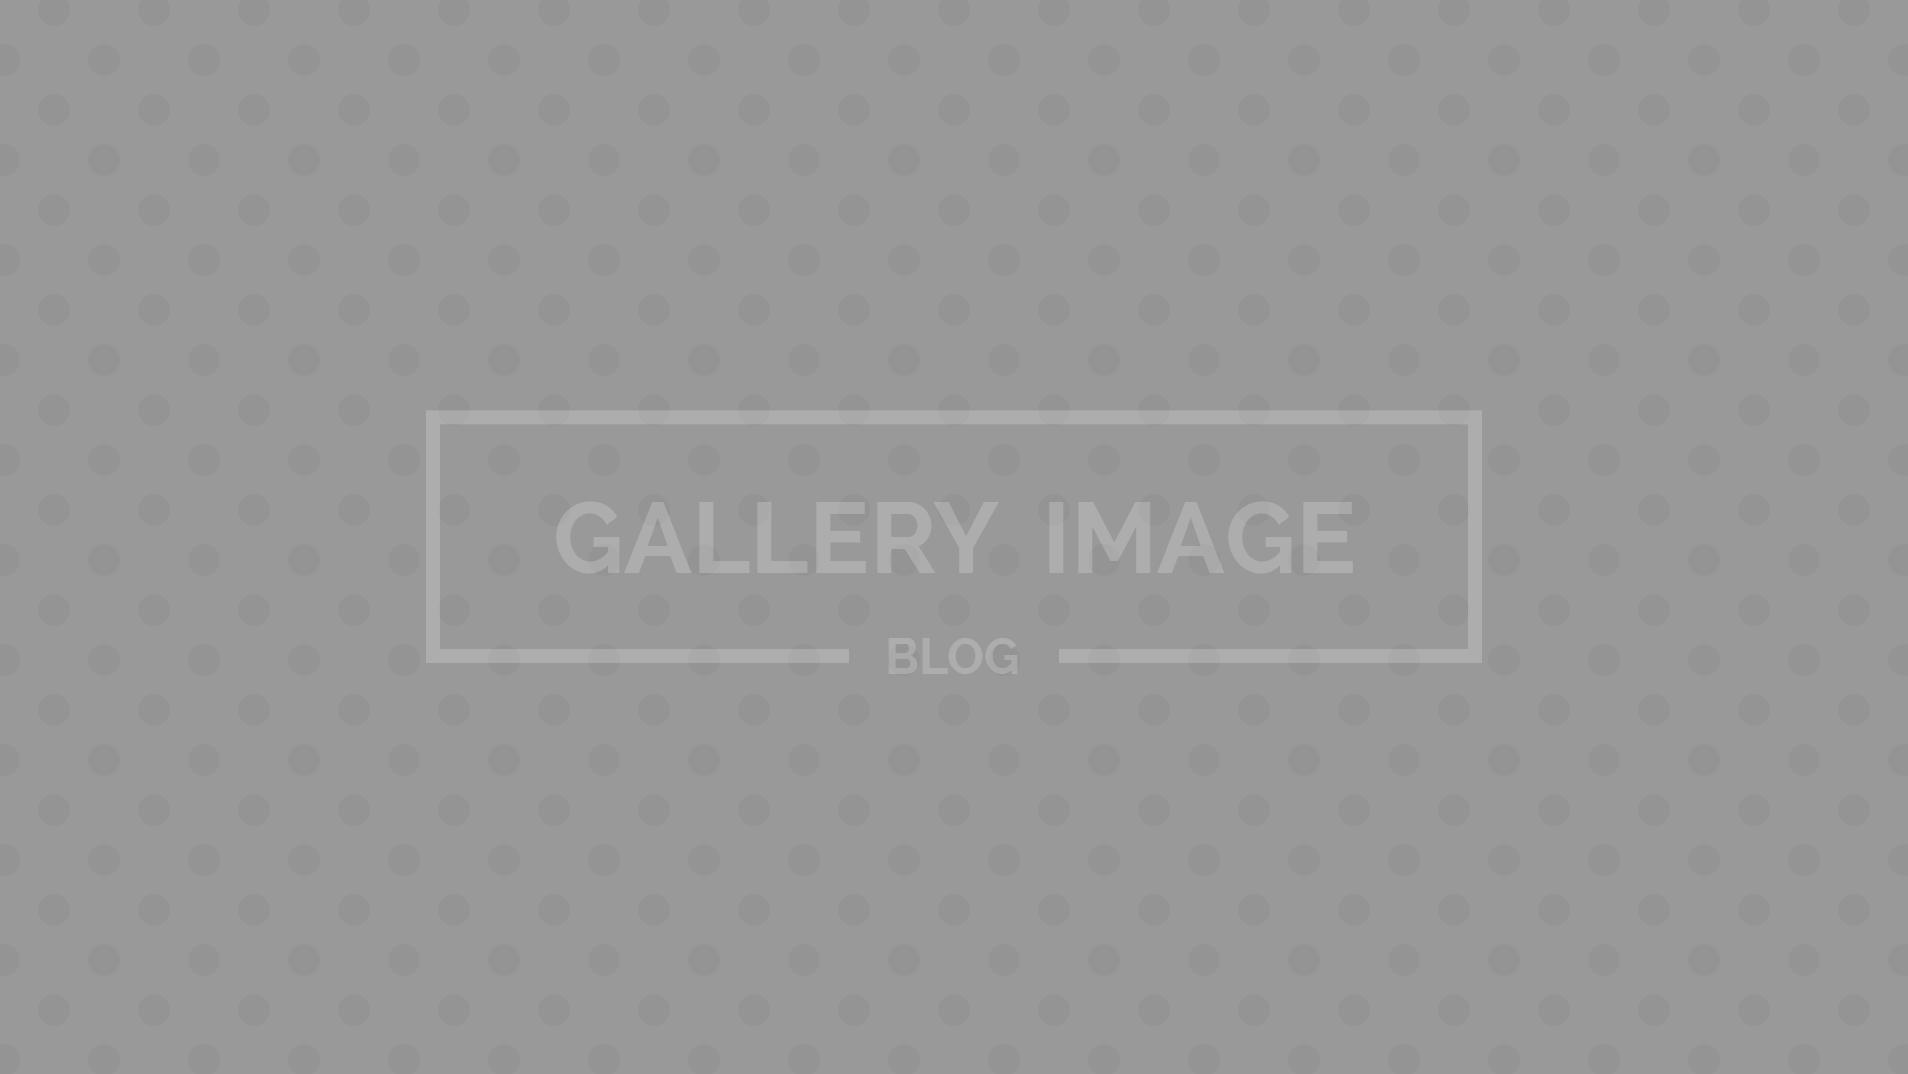 _blog_gallery_image_1